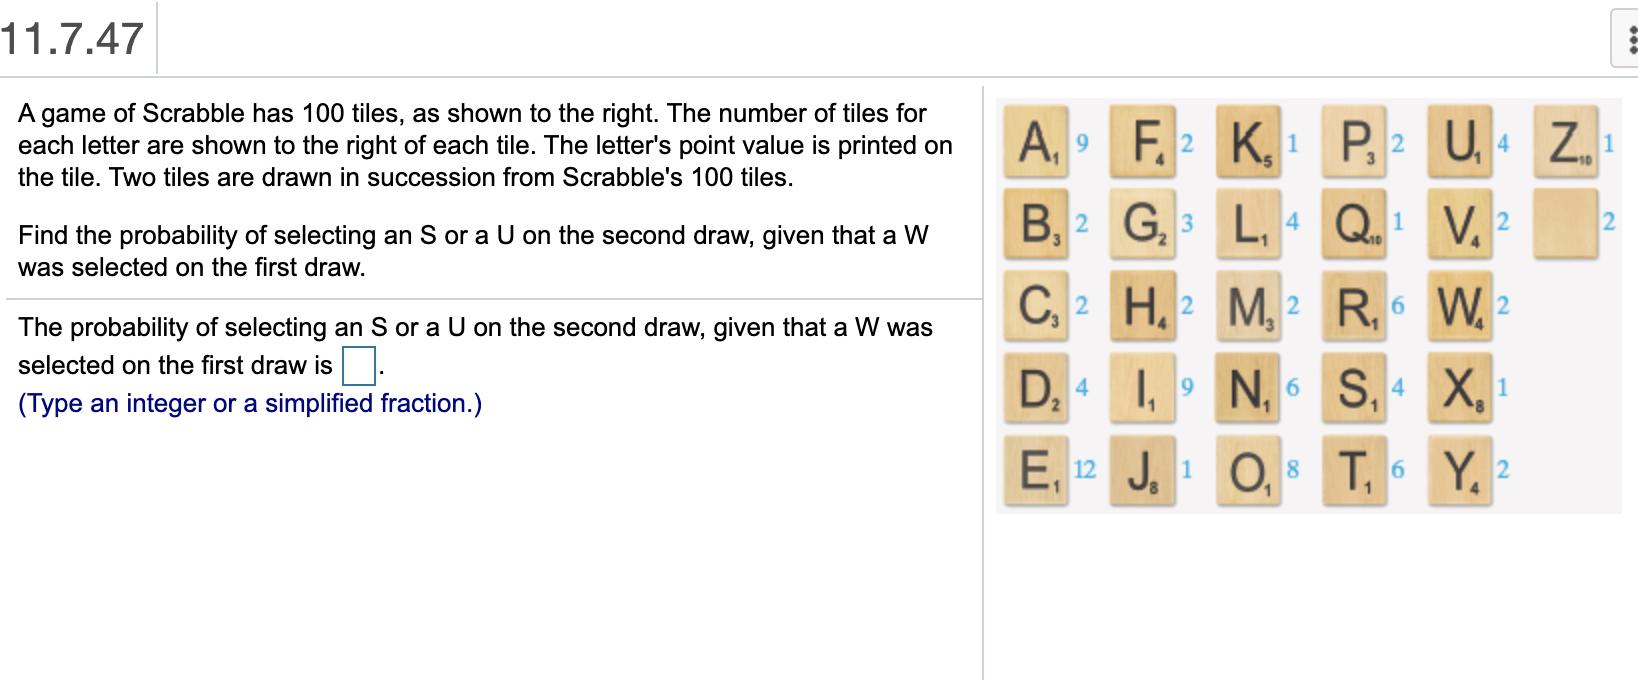 game of scrabble has 100 tiles